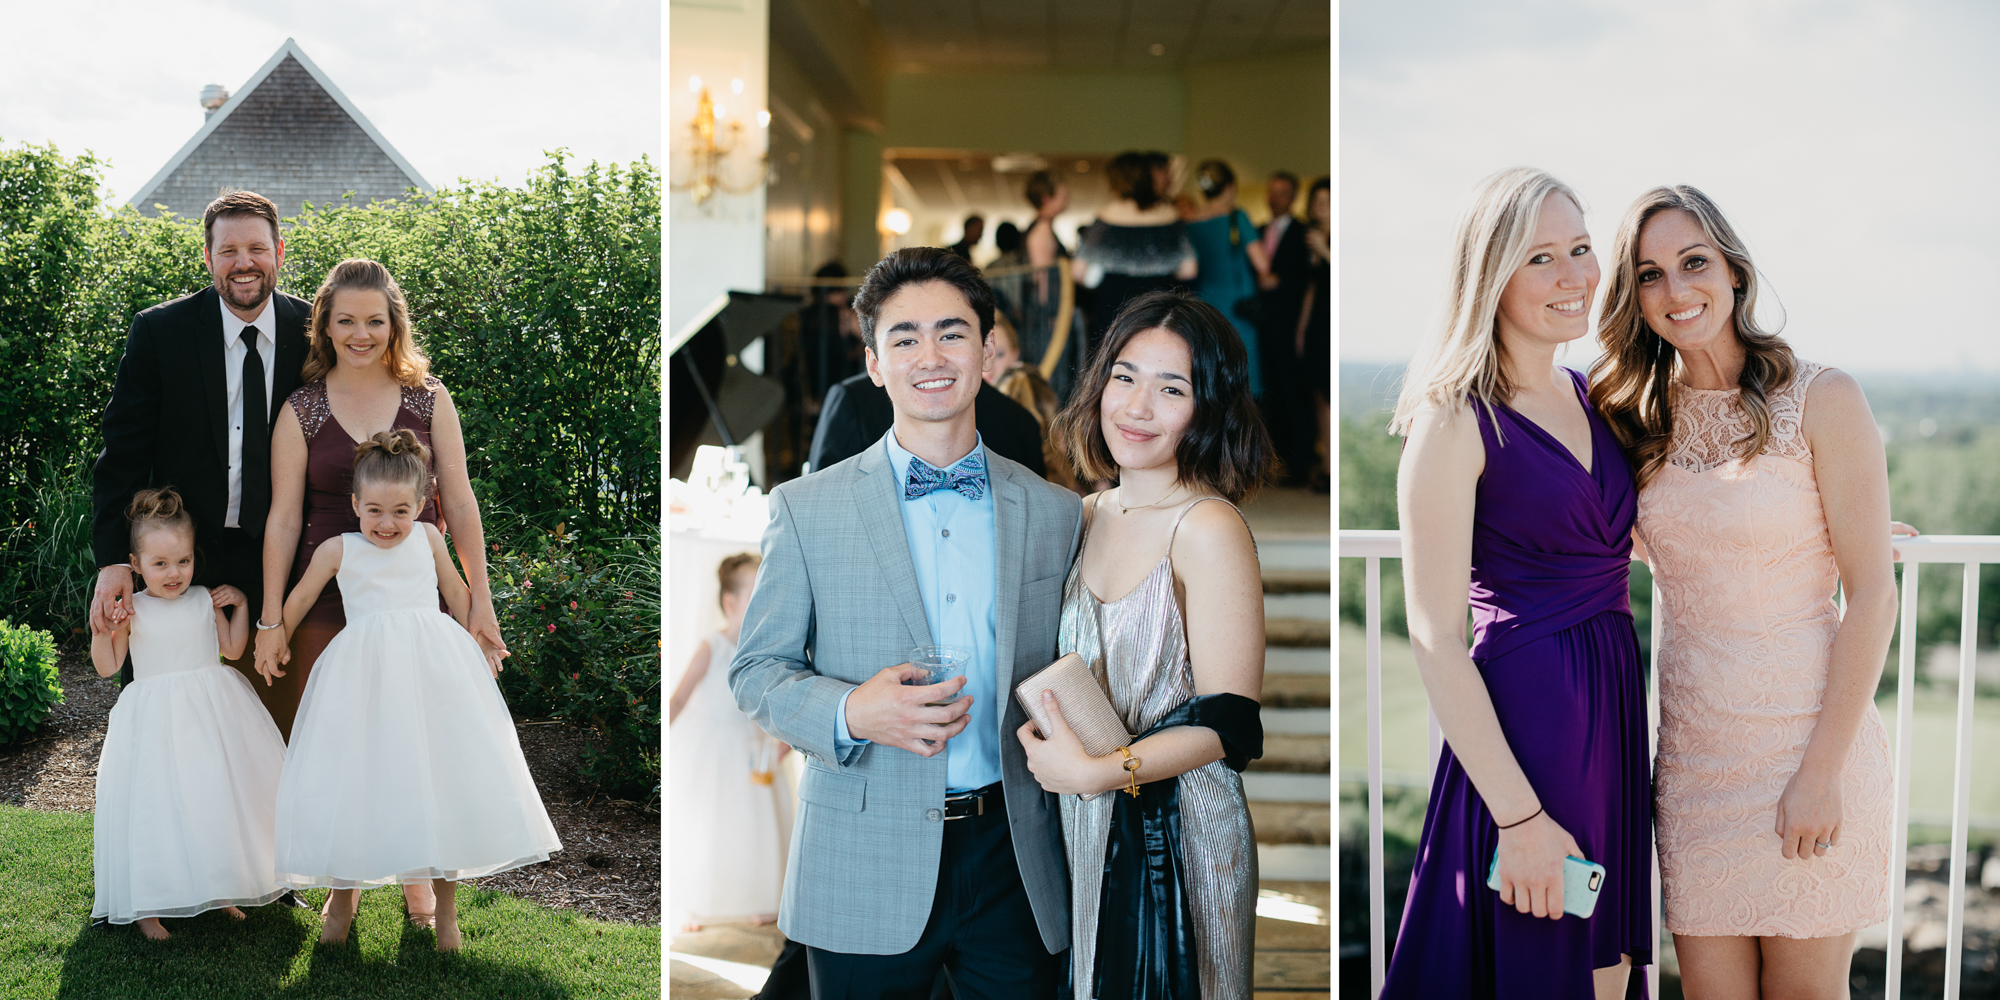 Jaclyn_Andrew_quincy_massachusetts_wedding022.jpg